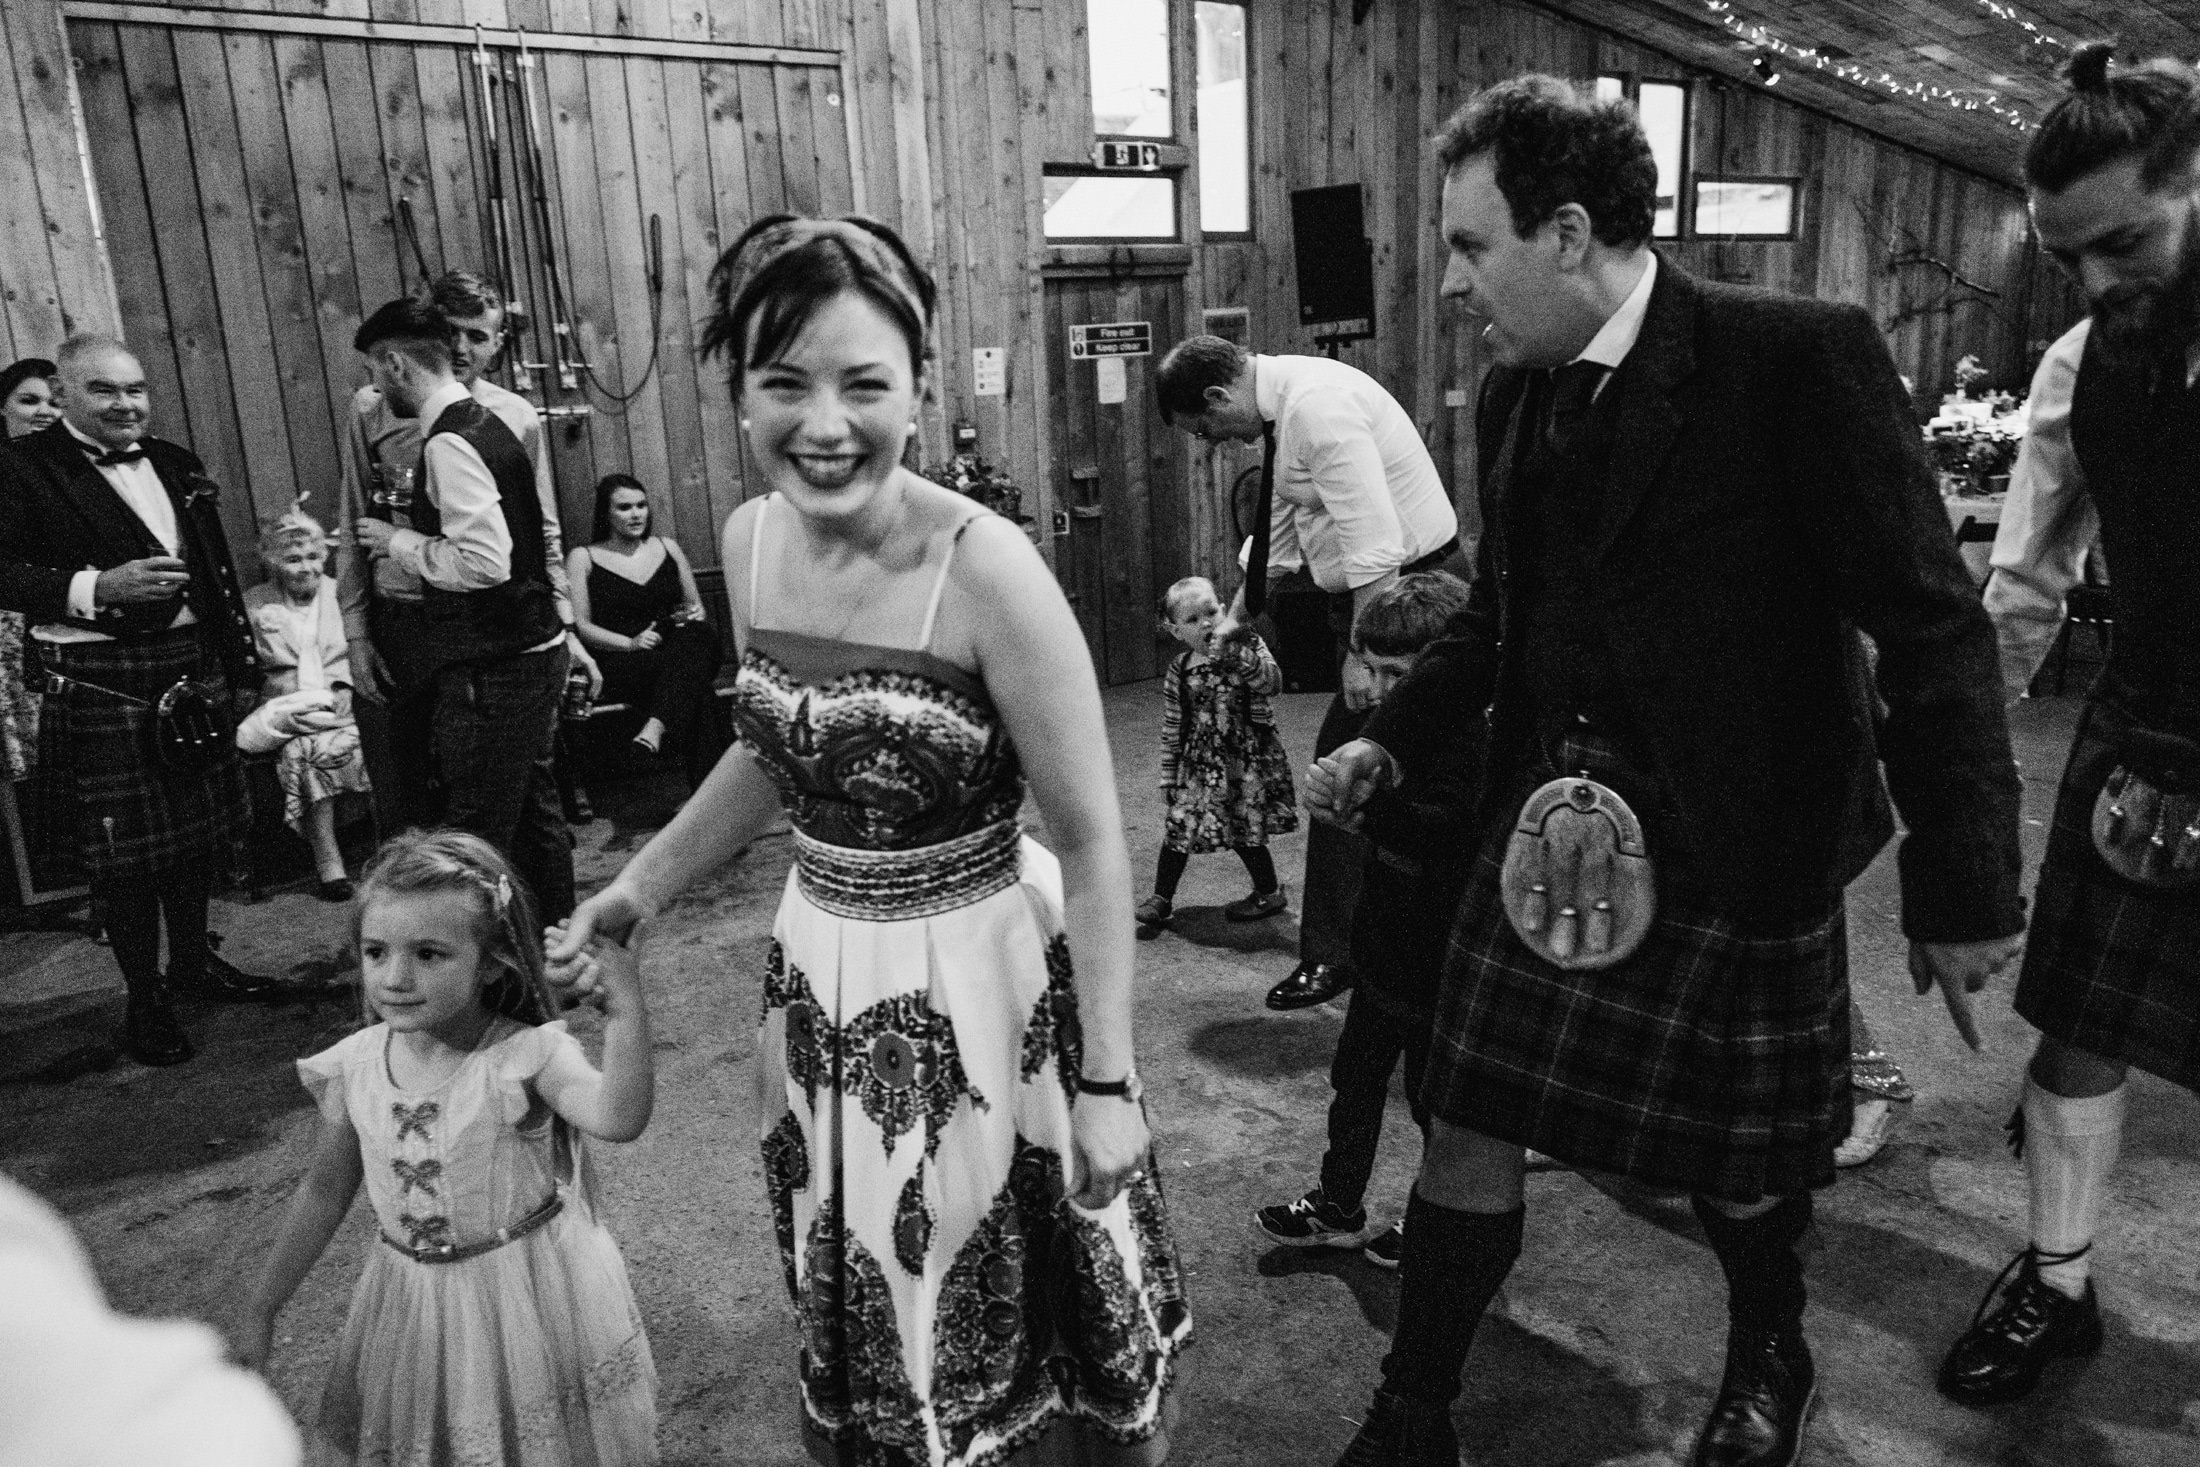 wedding guests ceilidh dancing in a barn